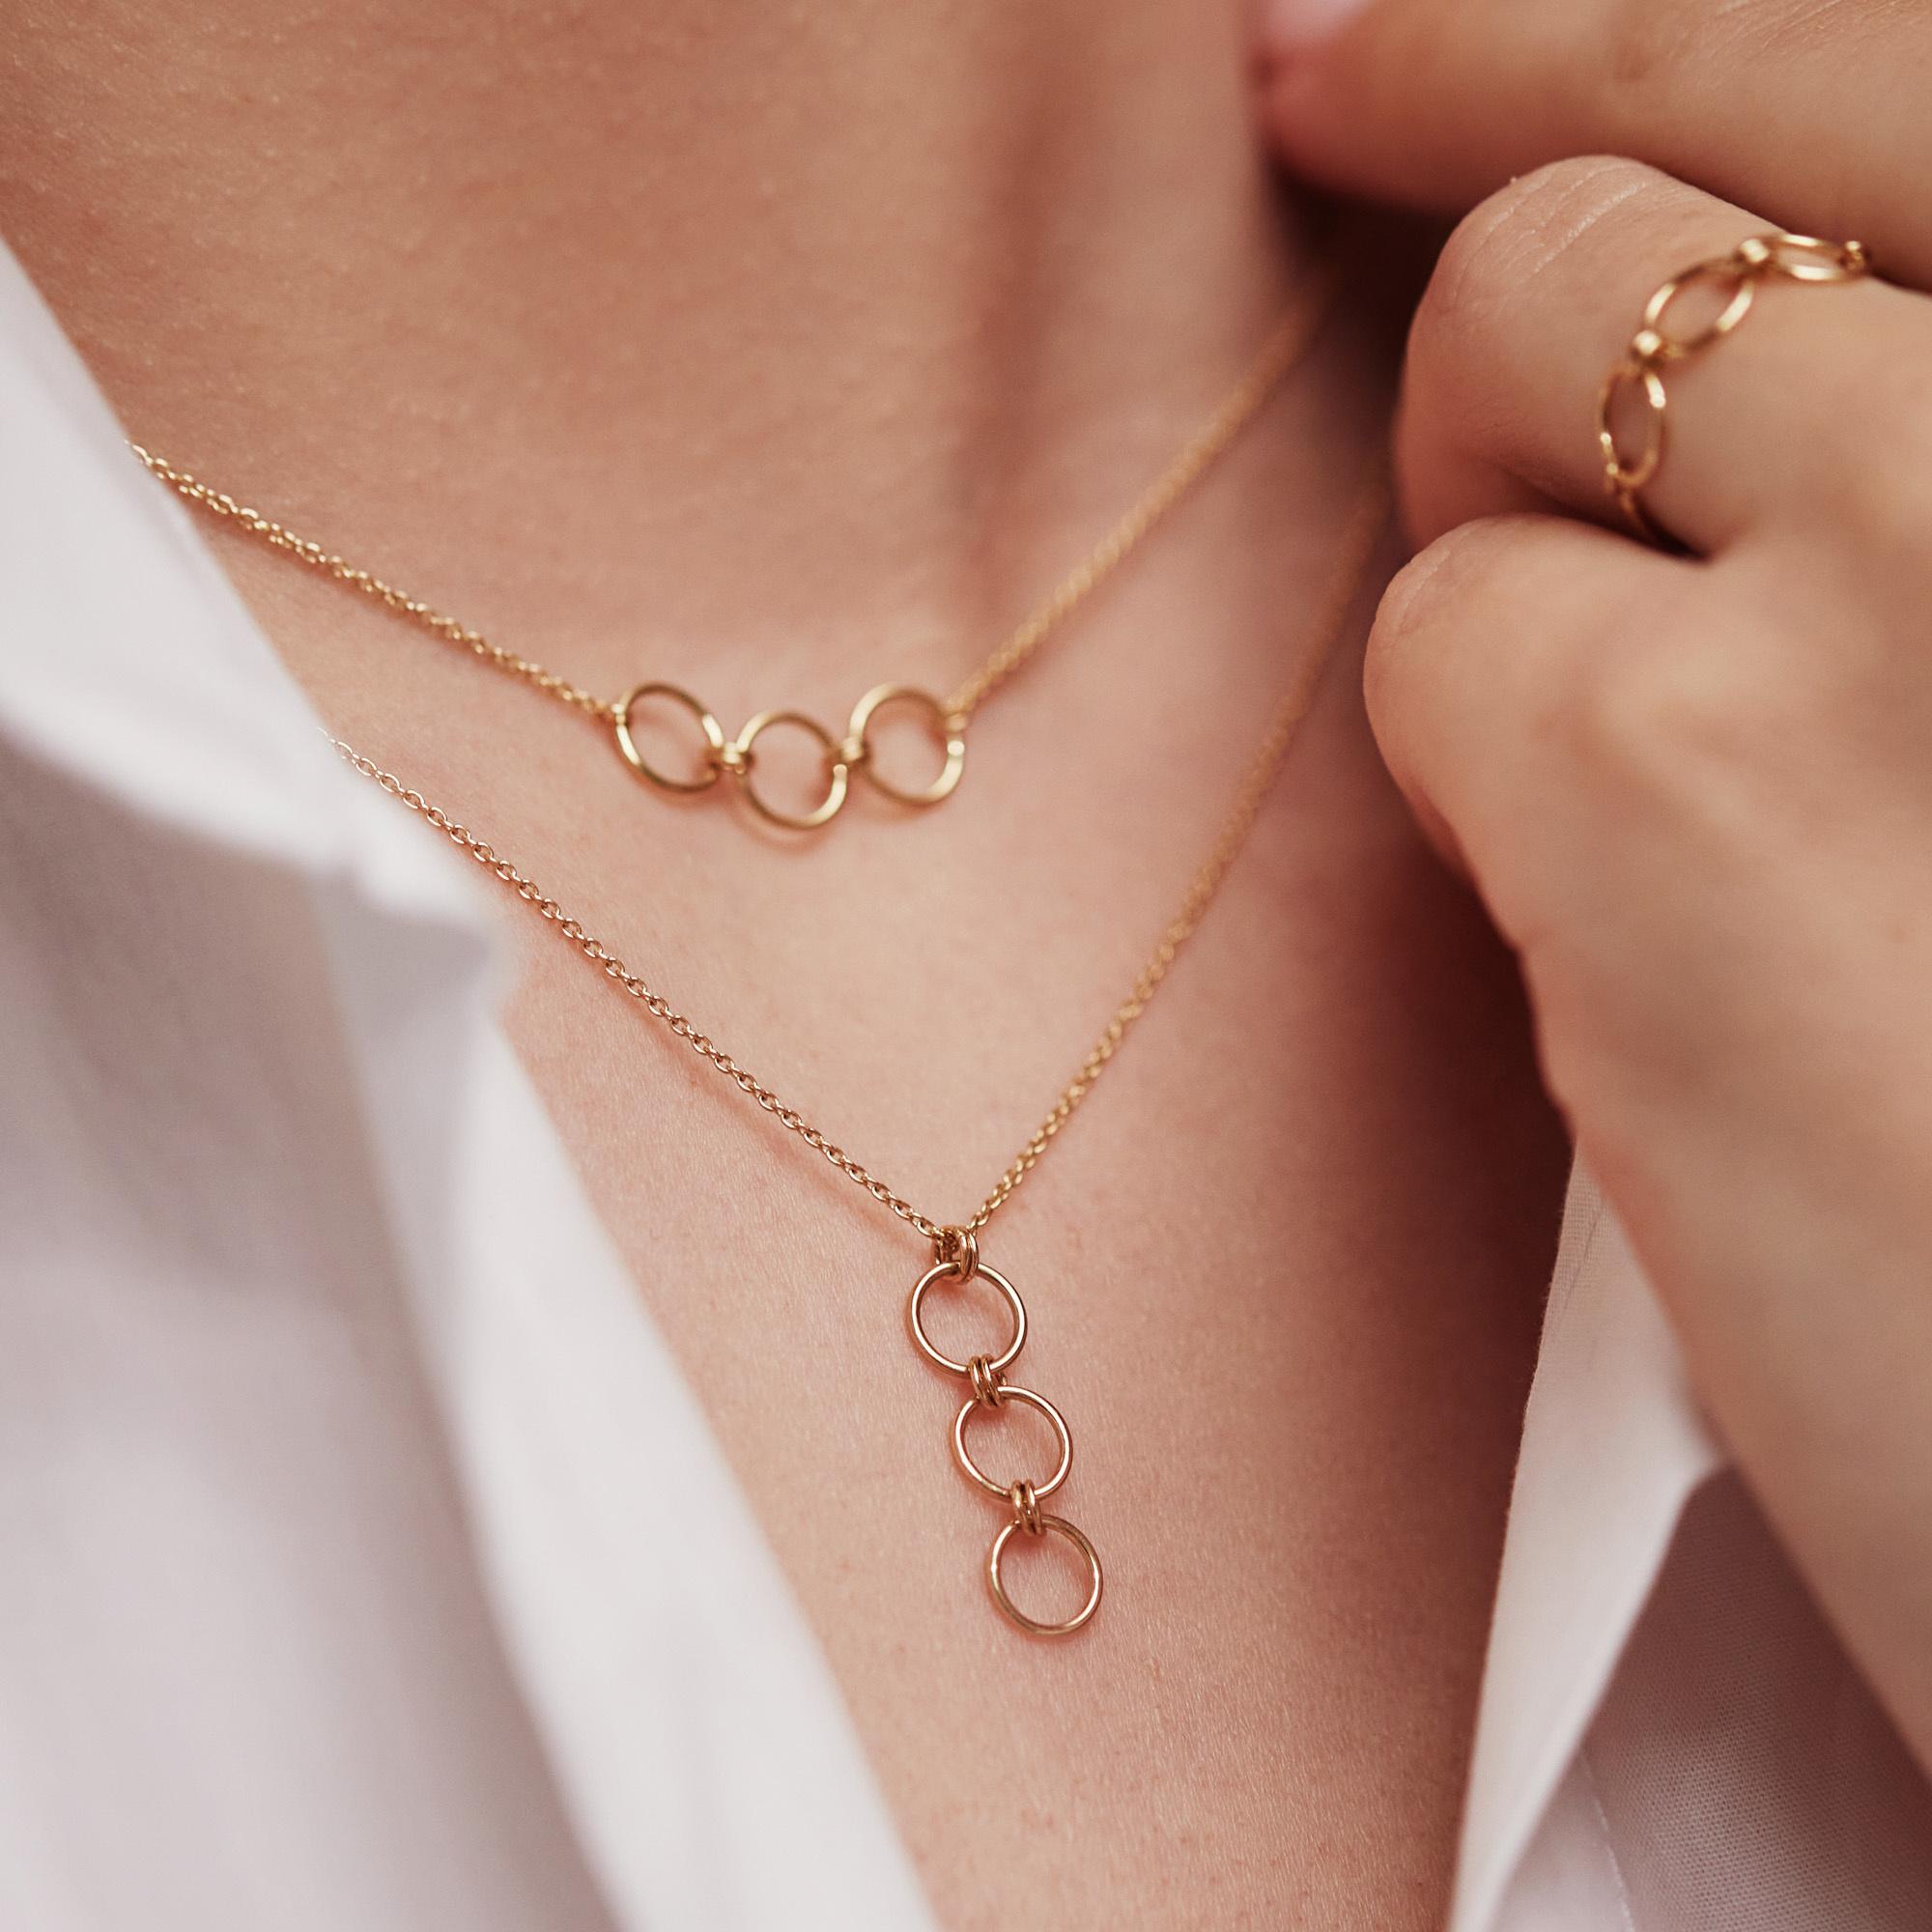 Isabel Bernard Belleville Anna 14 karat gold necklace